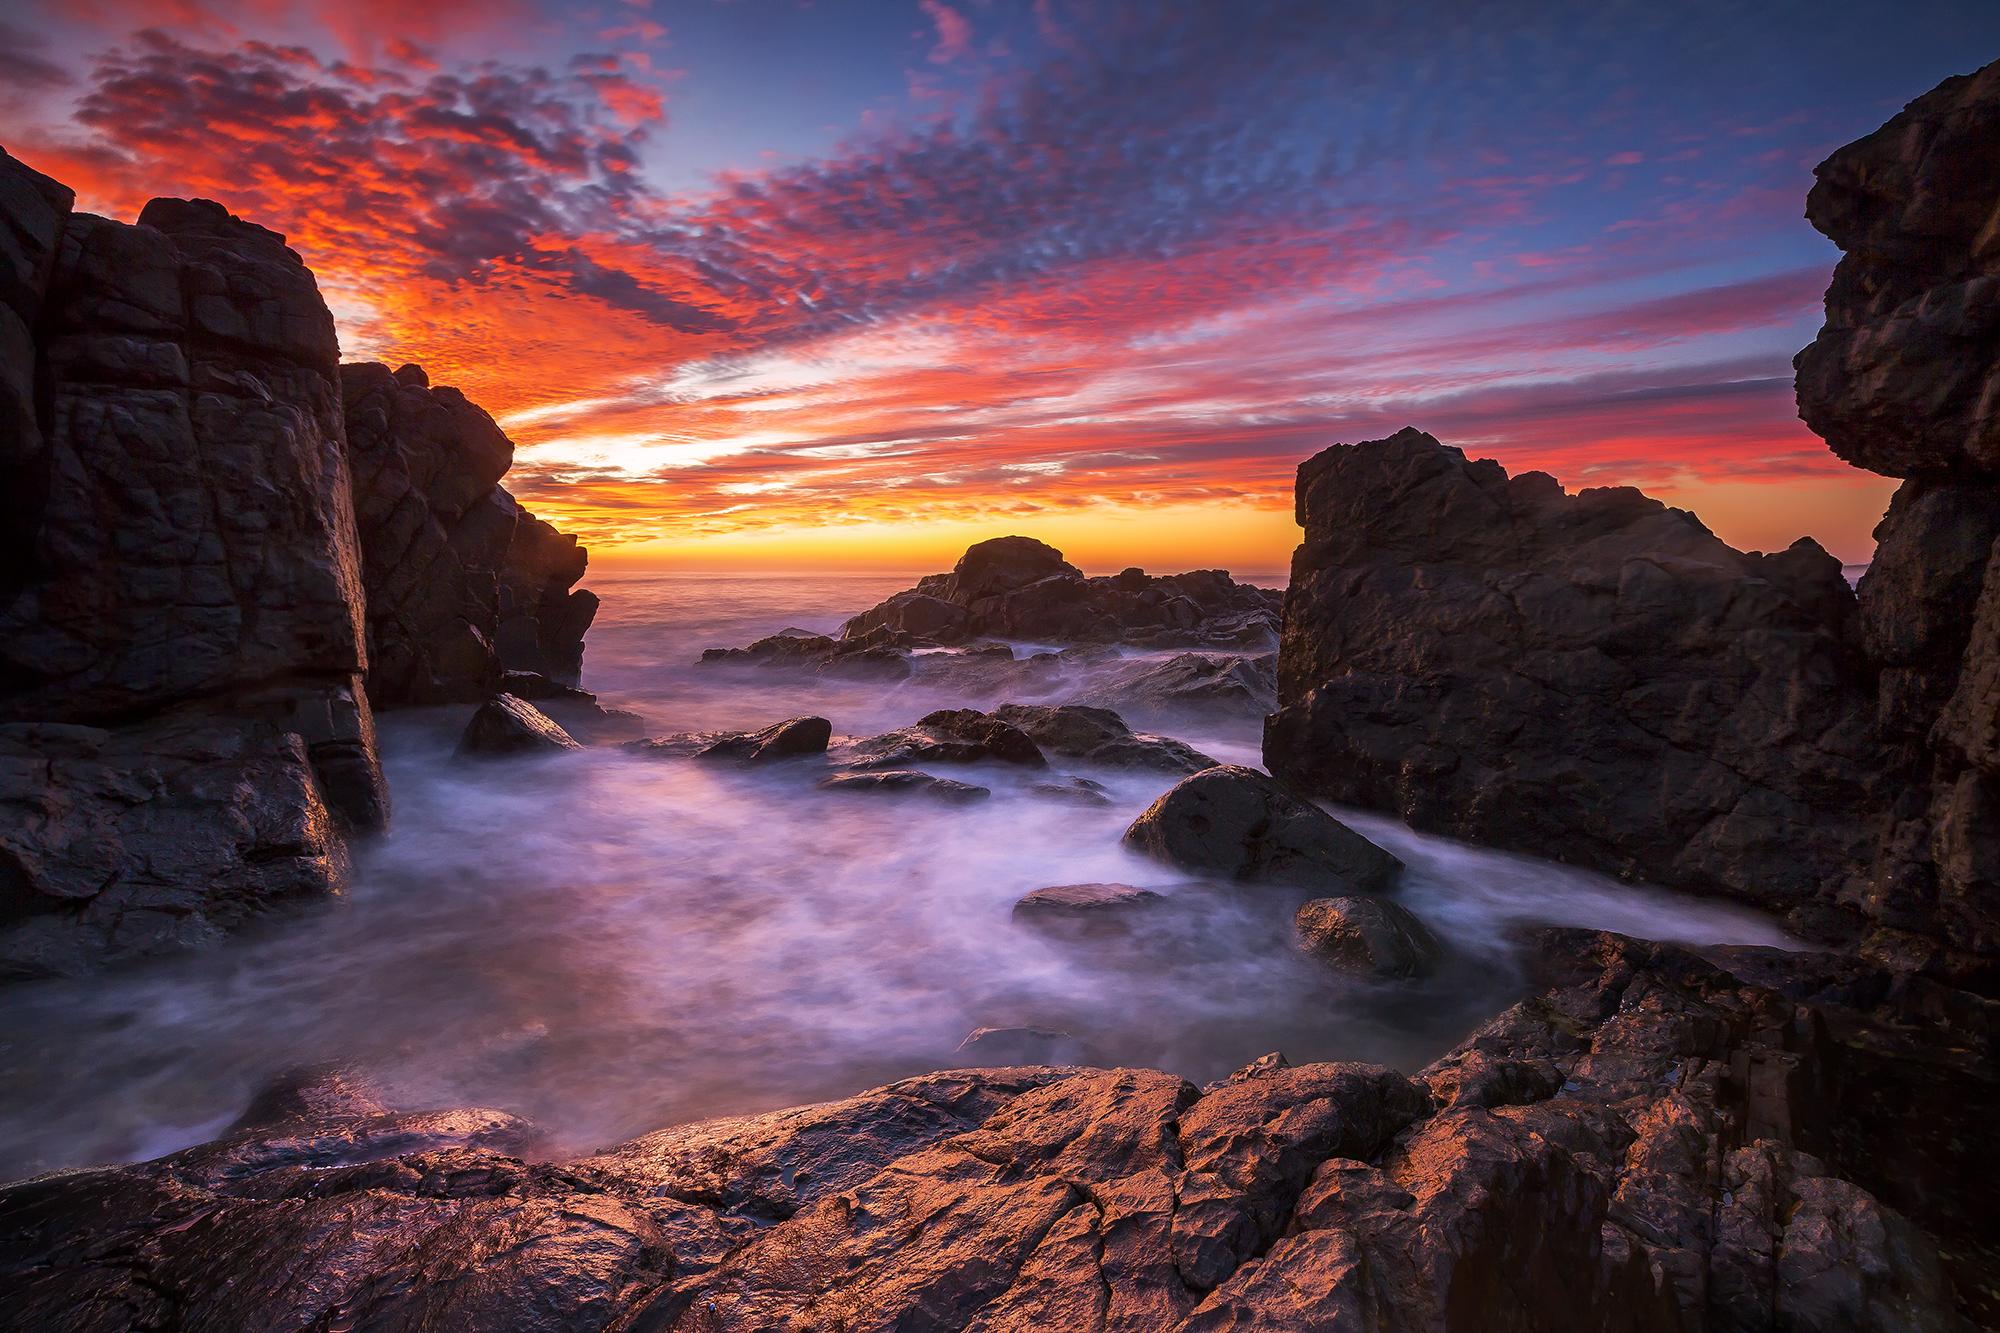 Hastings Point, NSW. Australia. #2